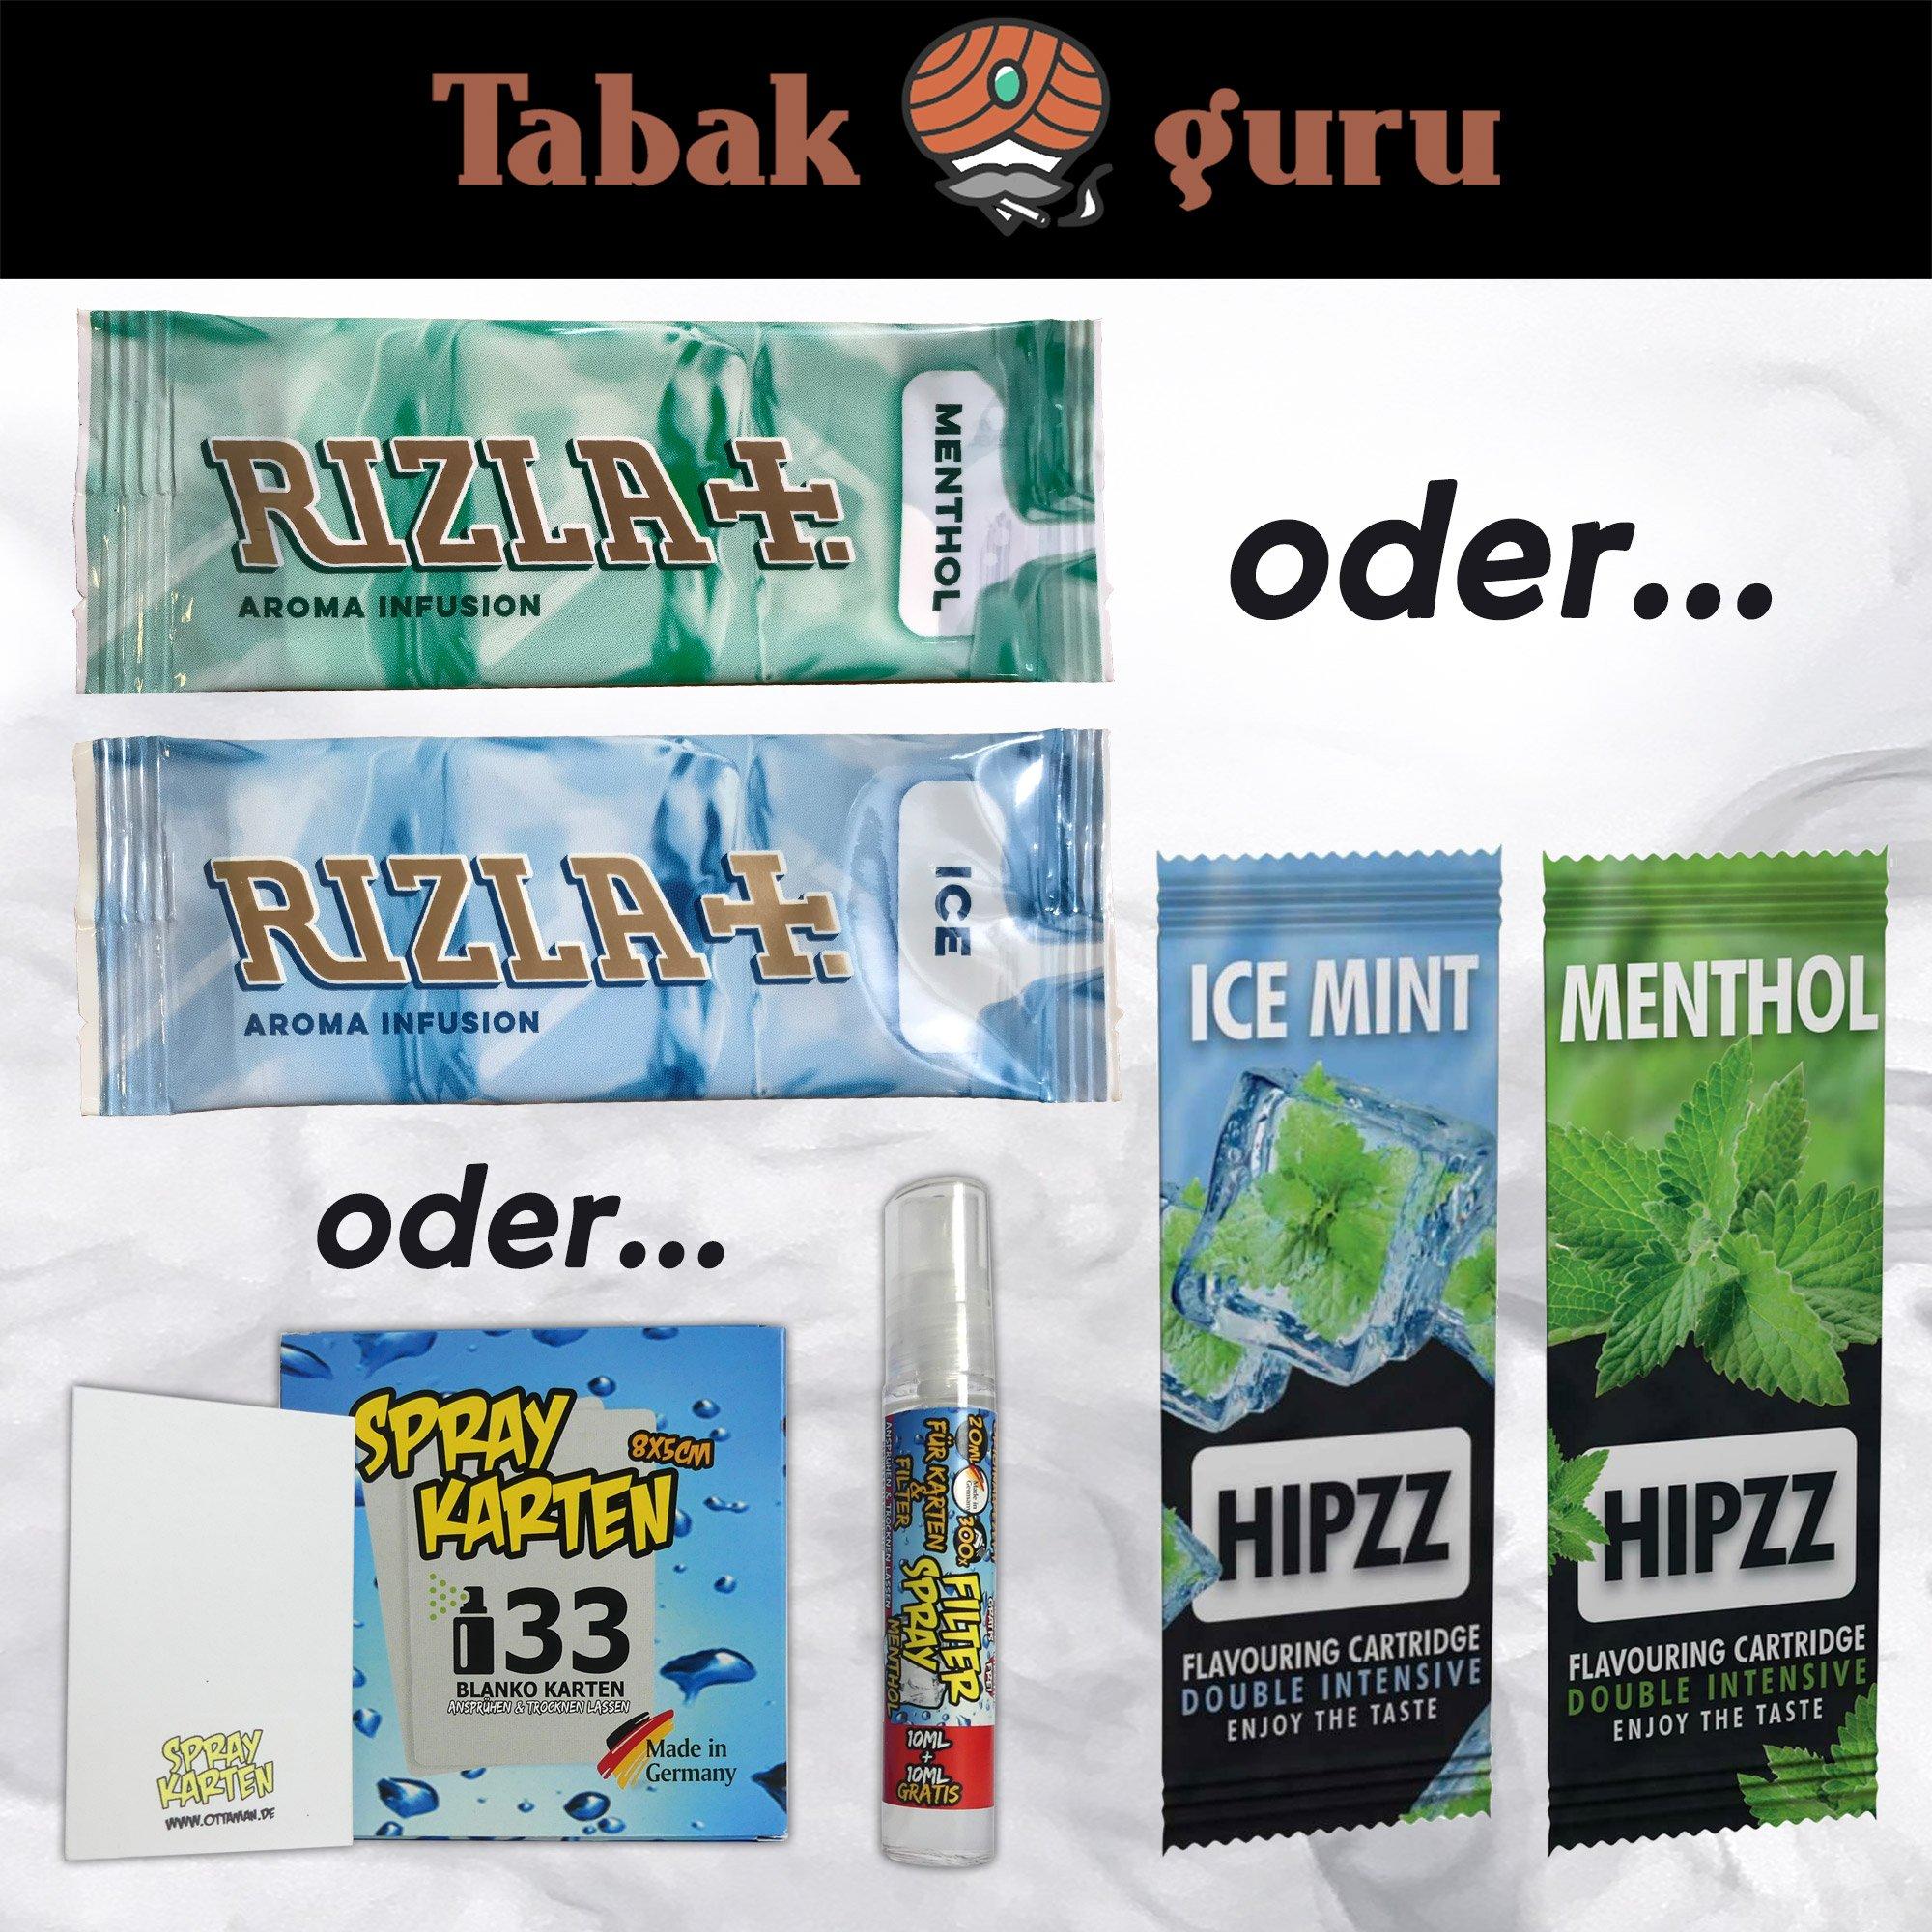 10 x Aromakarte Rizla ICE / MENTHOL, HIPZZ ICE / MENTHOL, Menthol-Spray WÄHLBAR